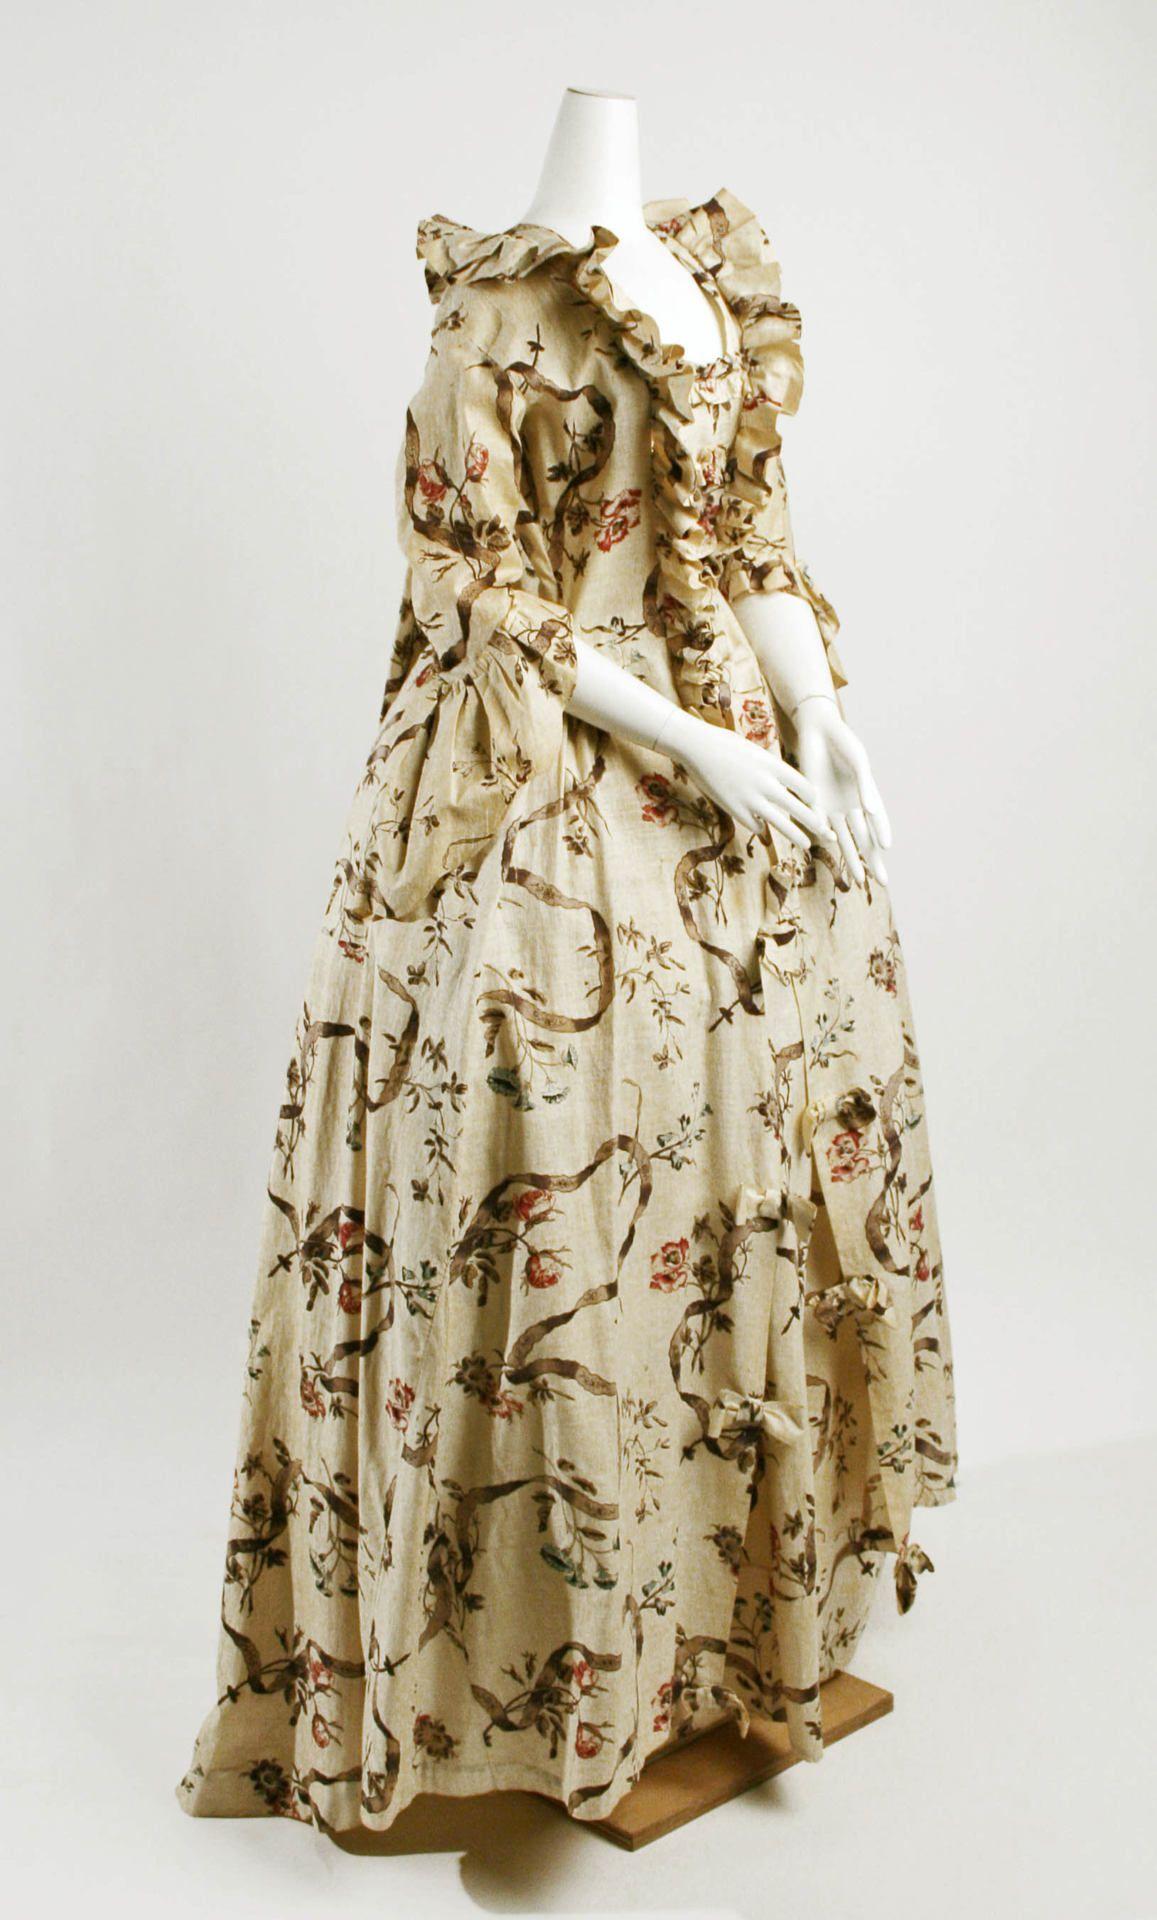 ROBE A LA FRANCAISE 1750-1775 ESCOTE CON VOLANTES